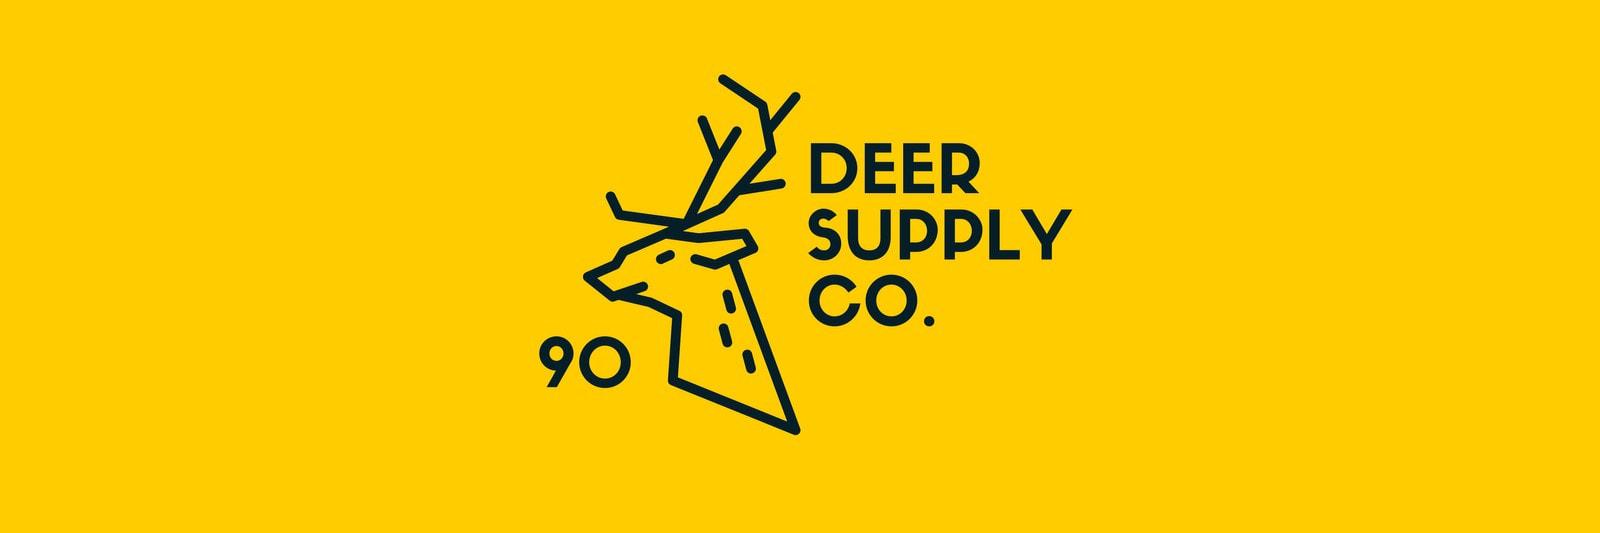 Yellow Illustrated Deer Twitter Header